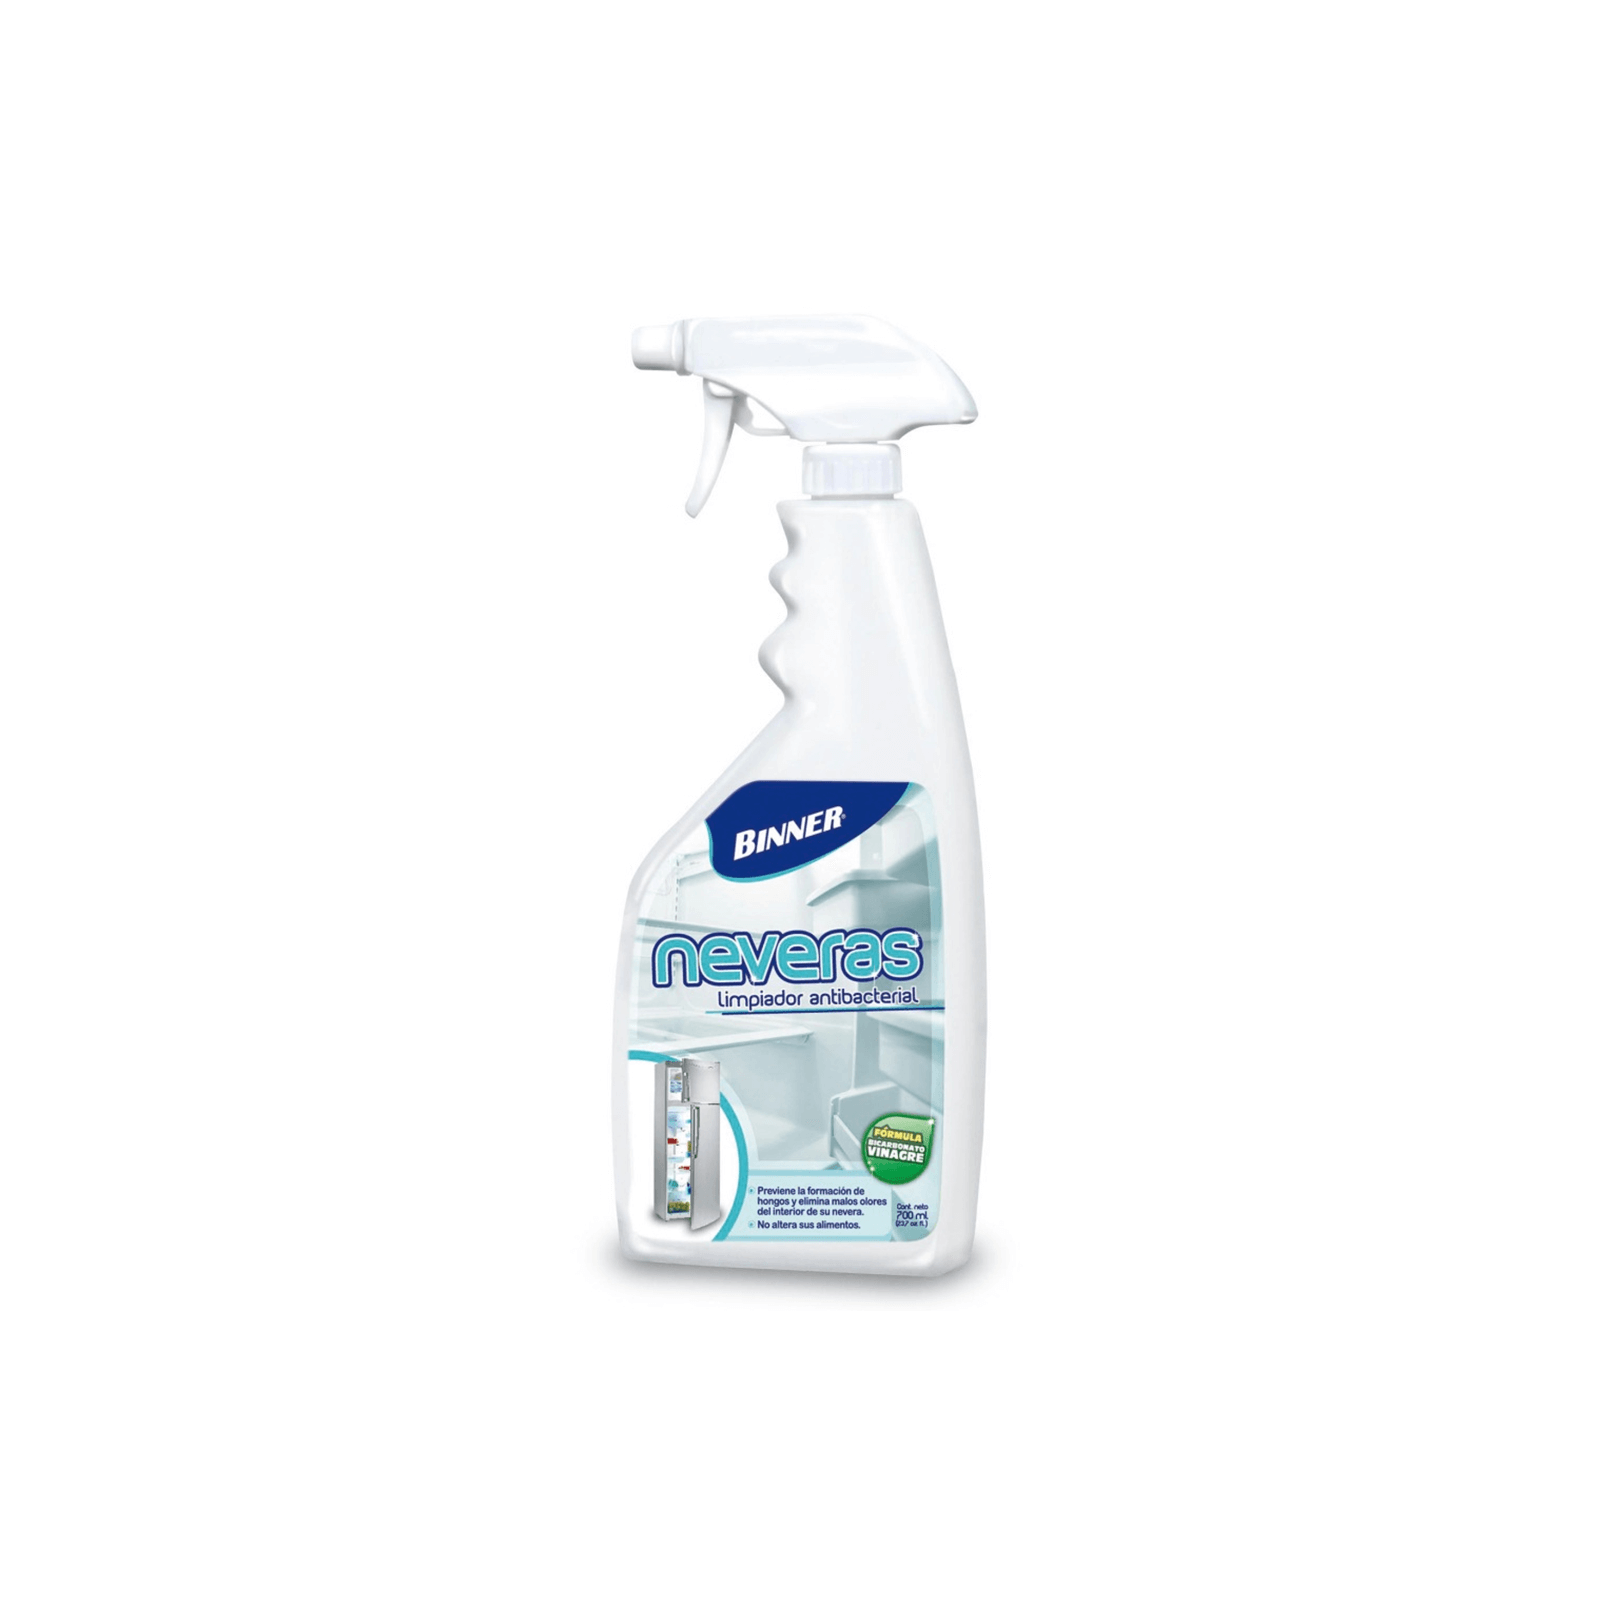 Limpiador Antibactarial De Neveras Binner